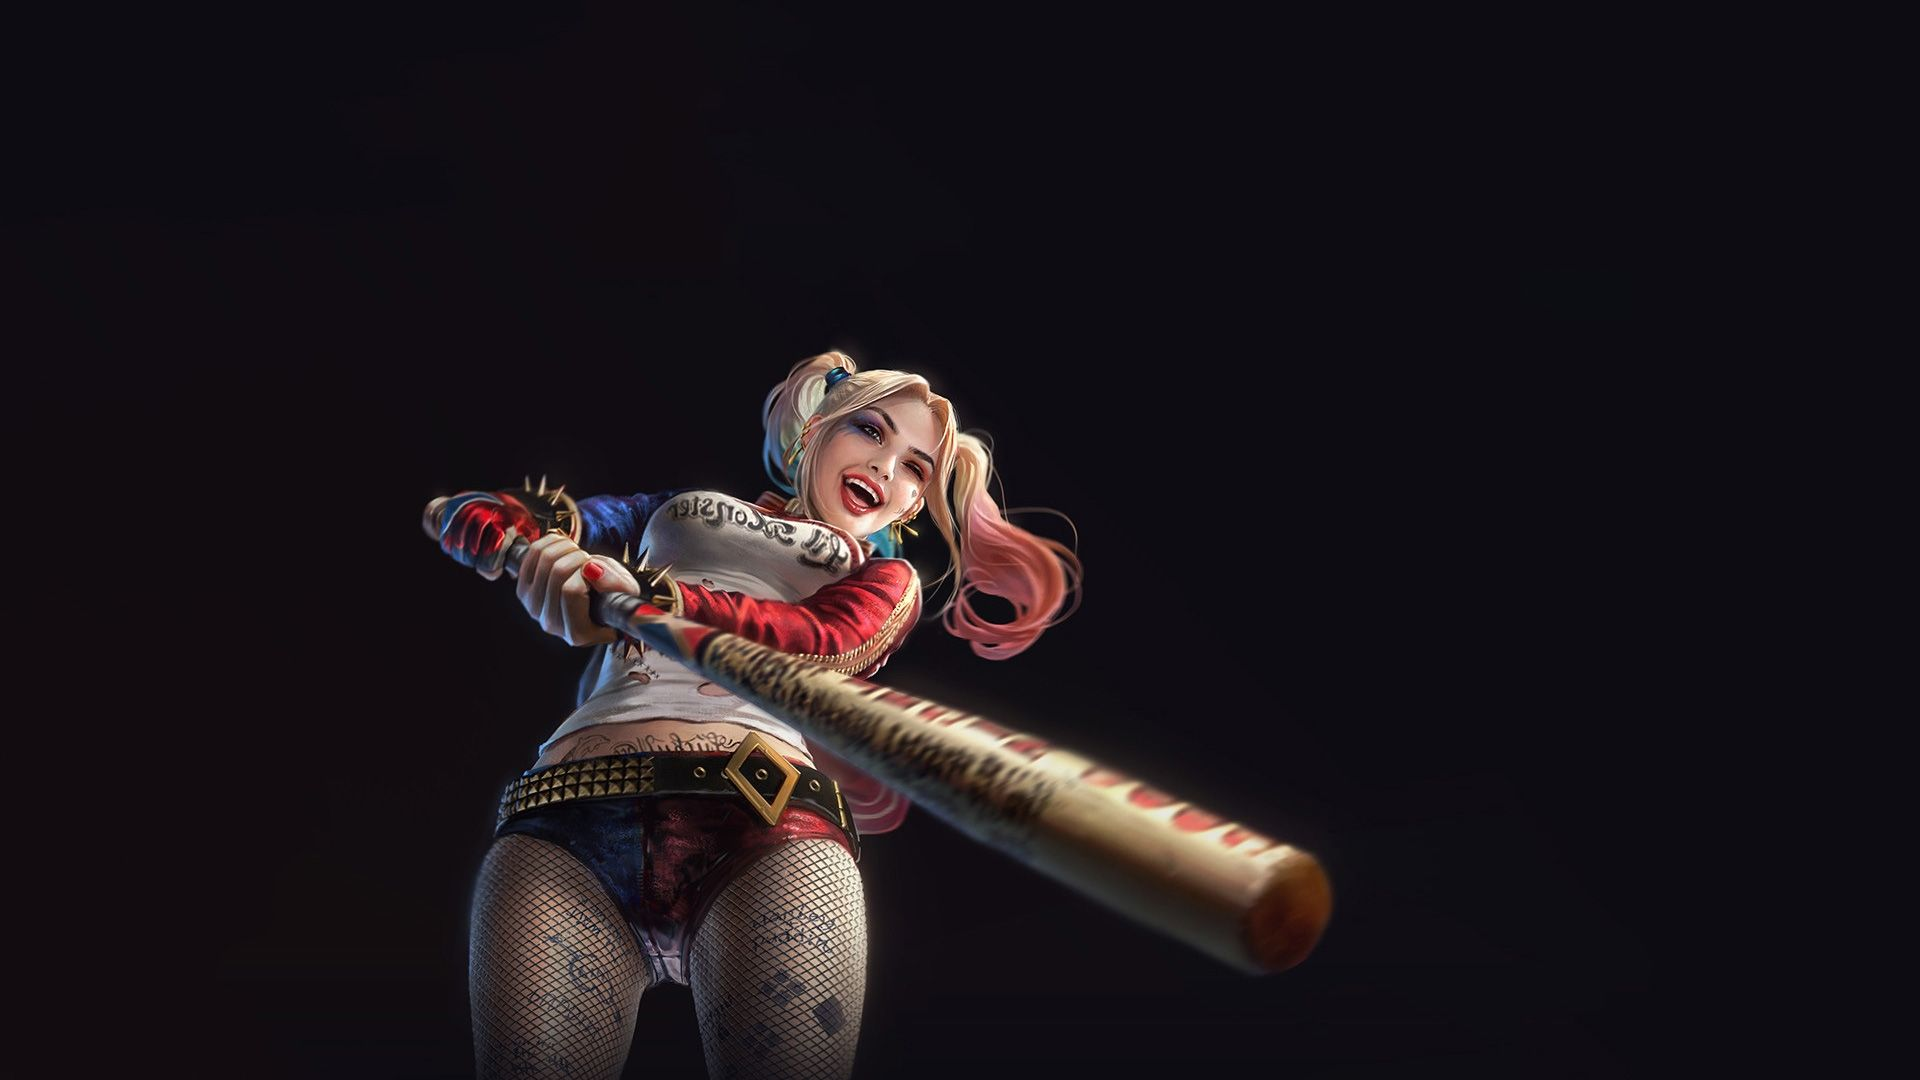 Suicide Squad Harley Quinn art, 1080p Wallpaper